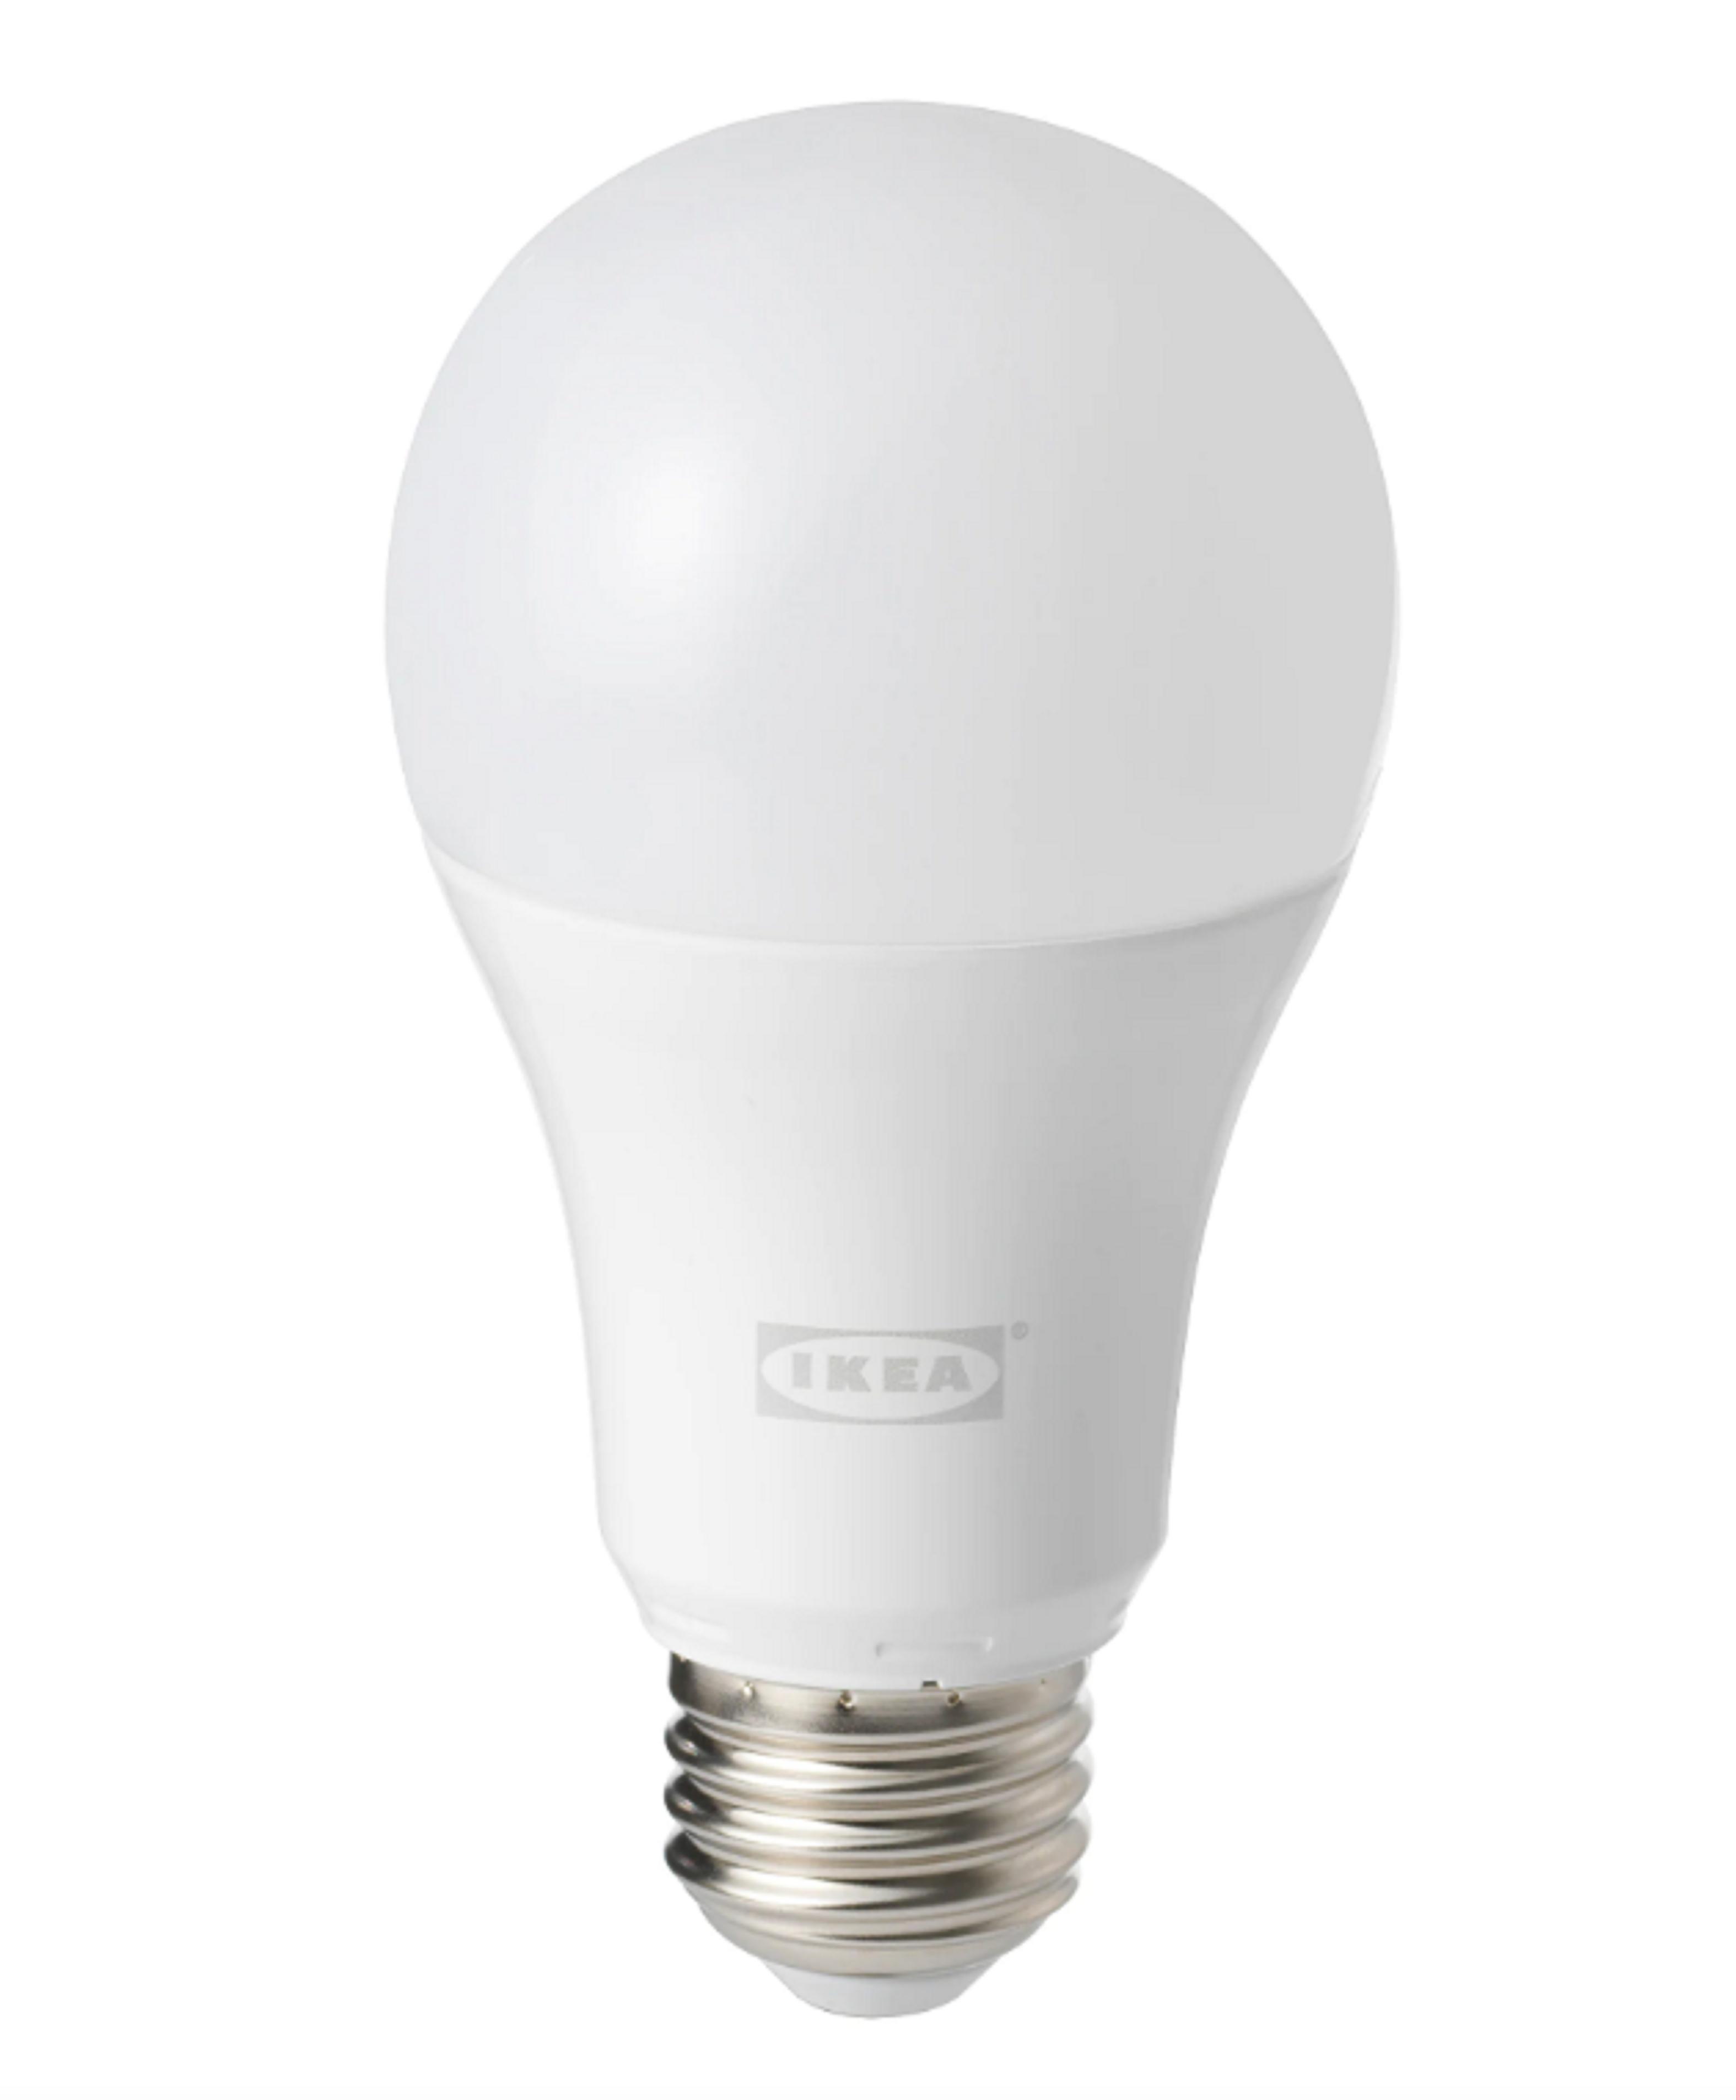 Ikea E27 Zigbee lamp wit spectrum Tradfri